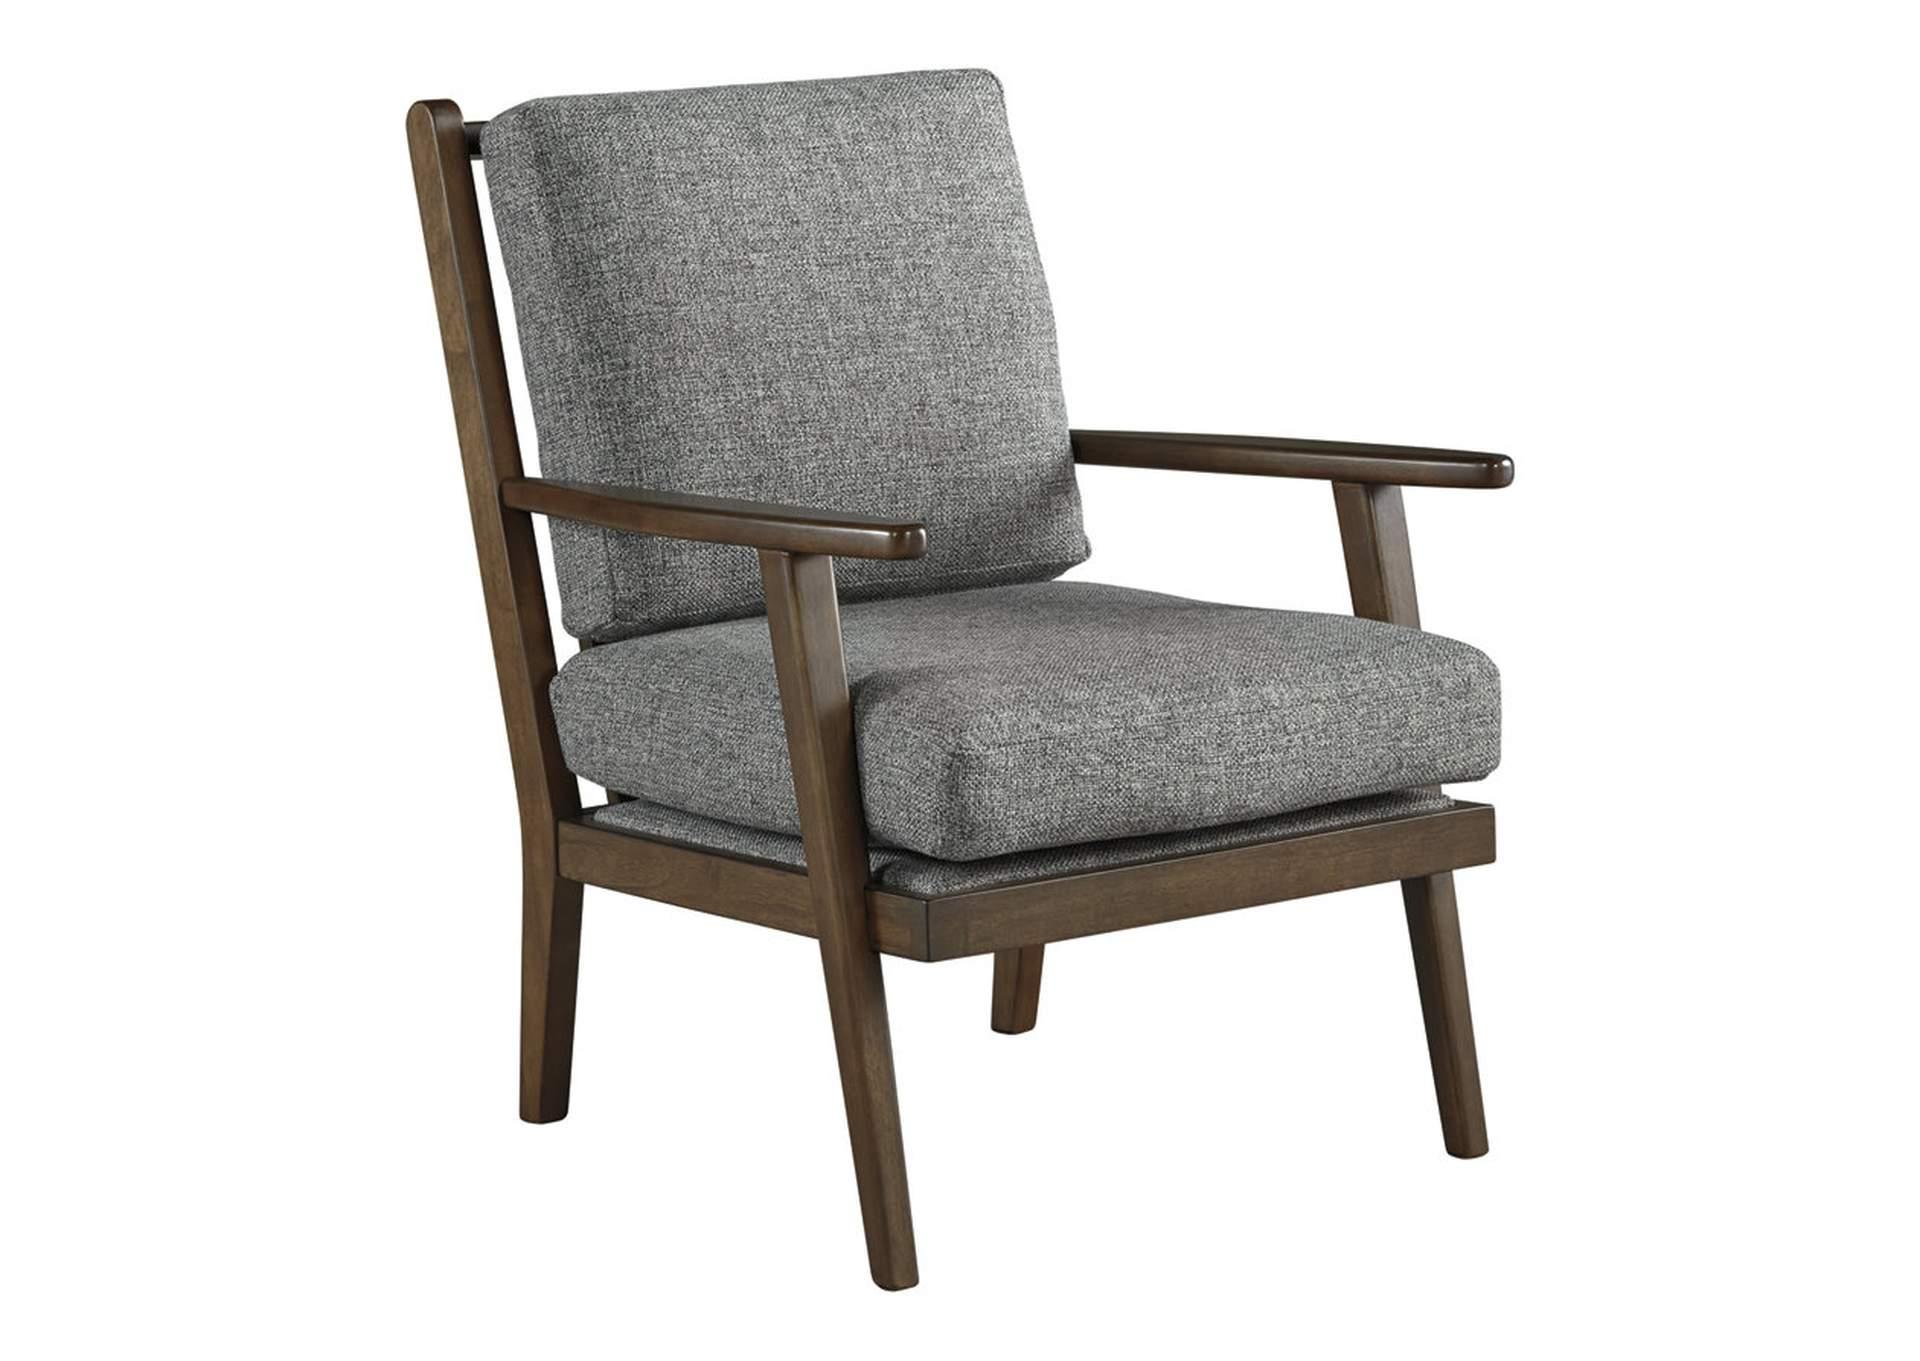 Zardoni Accent Chair